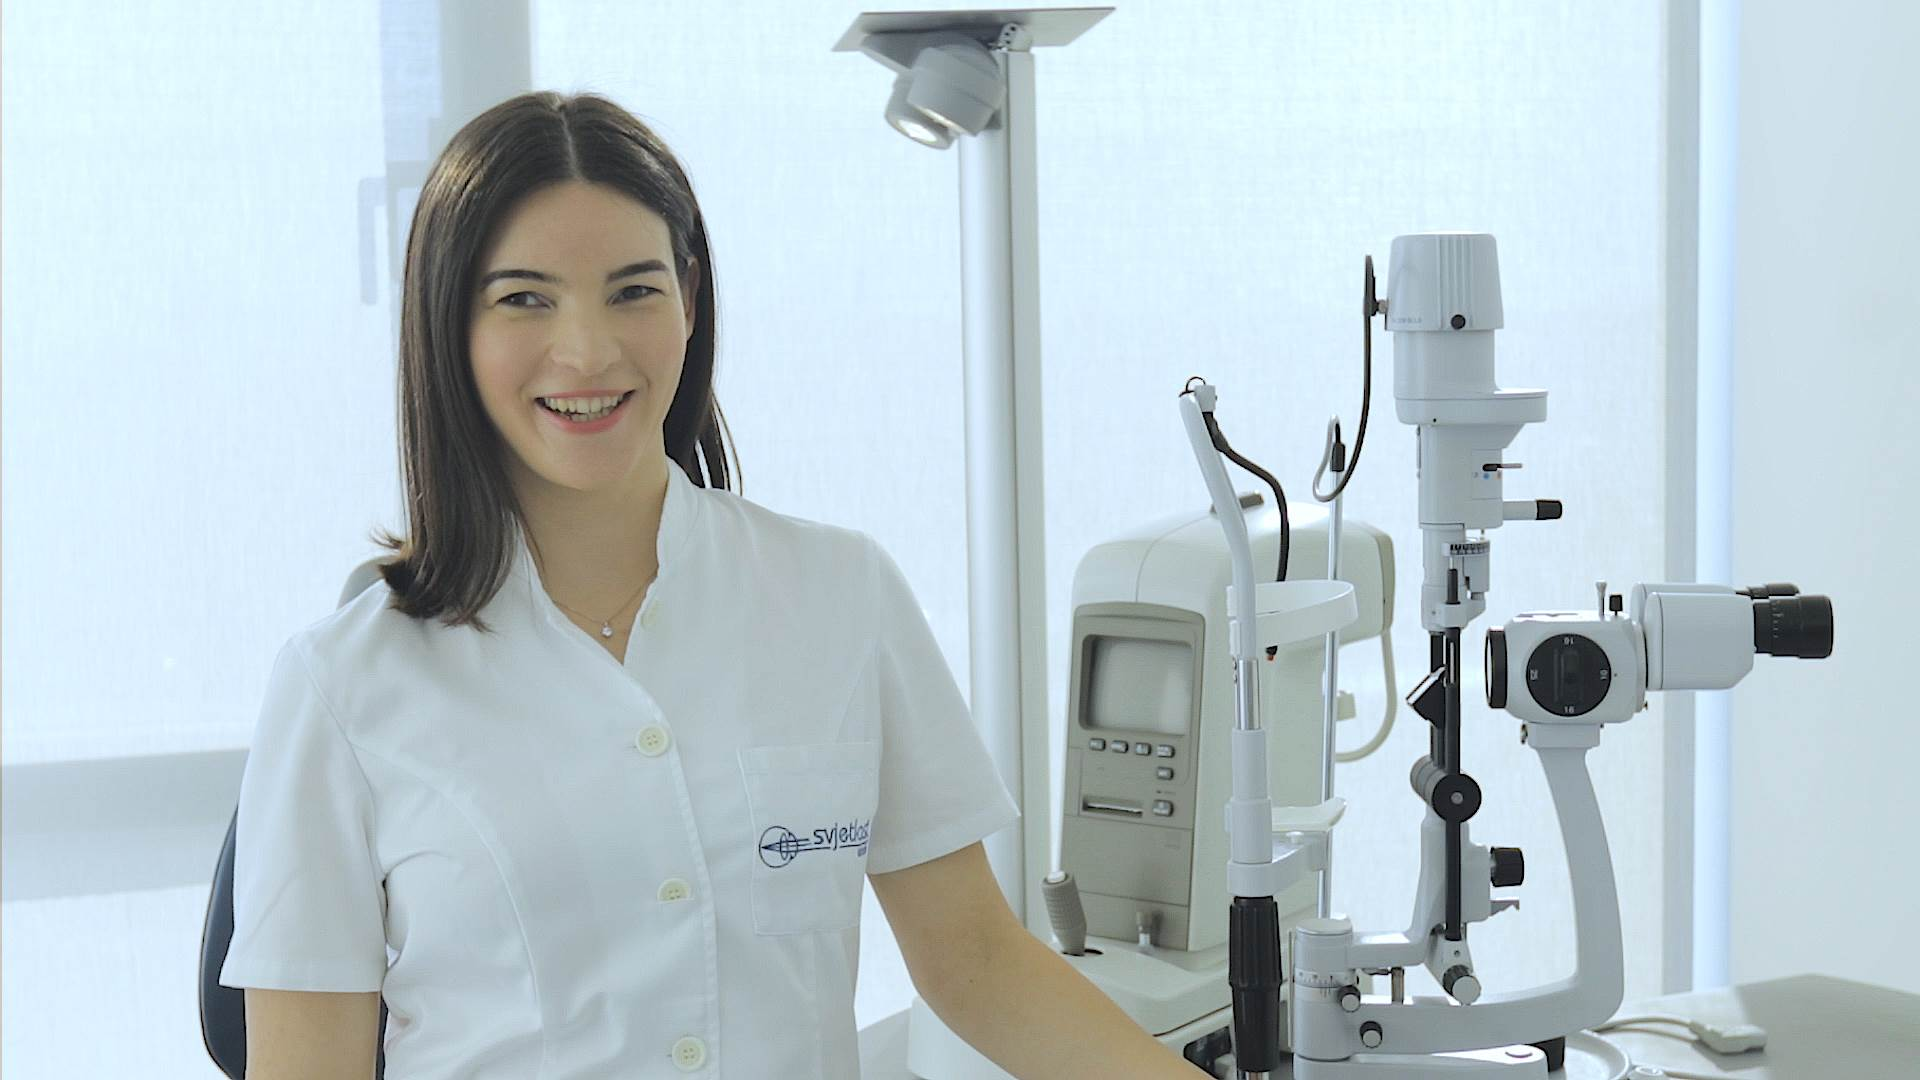 Ana Aničić, Klinika Svjetlost, mondo klinika